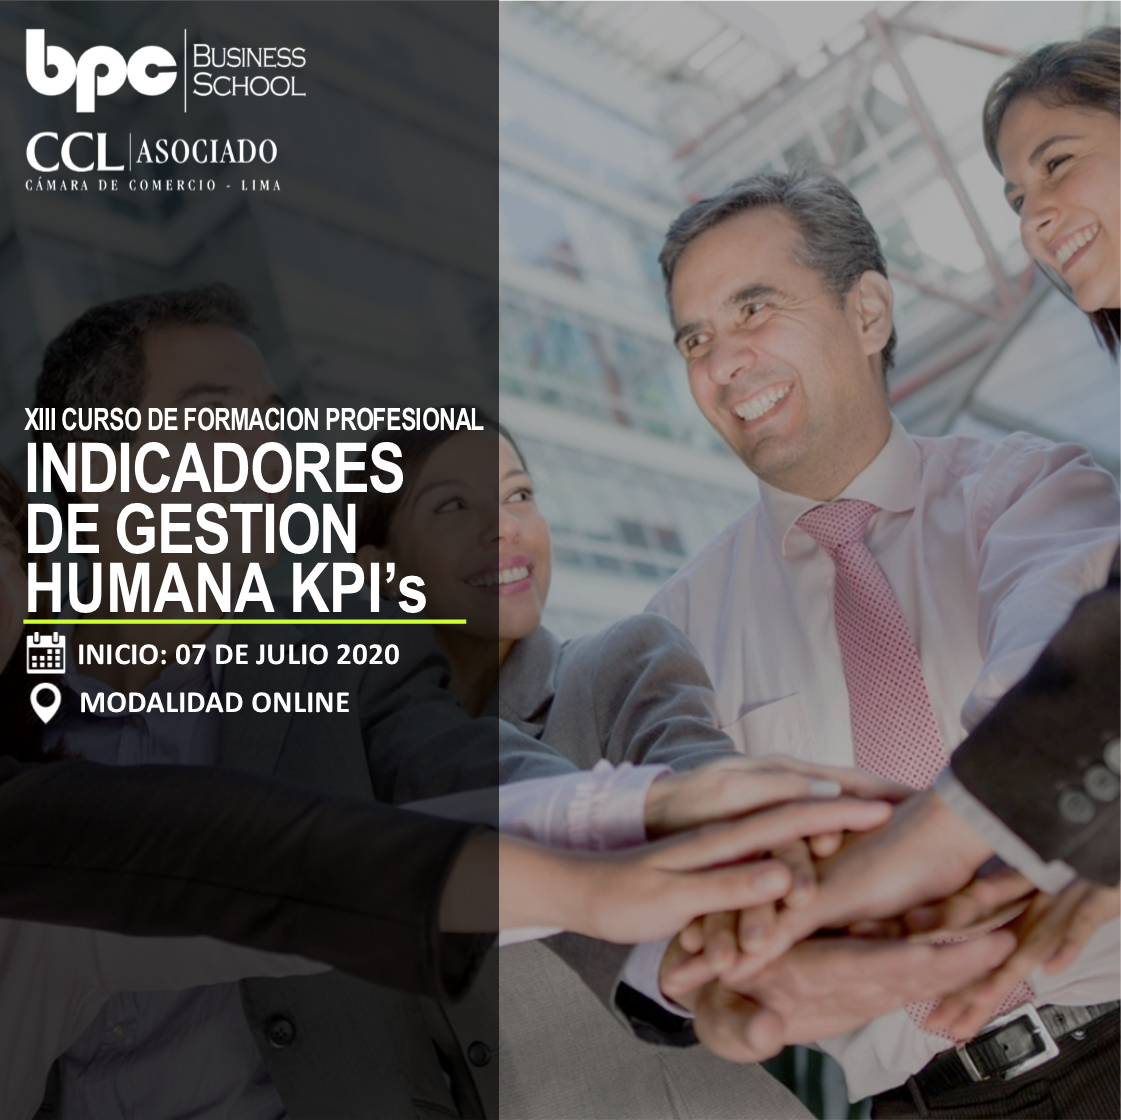 XIII Curso de Indicadores de Gestión Humana KPI's